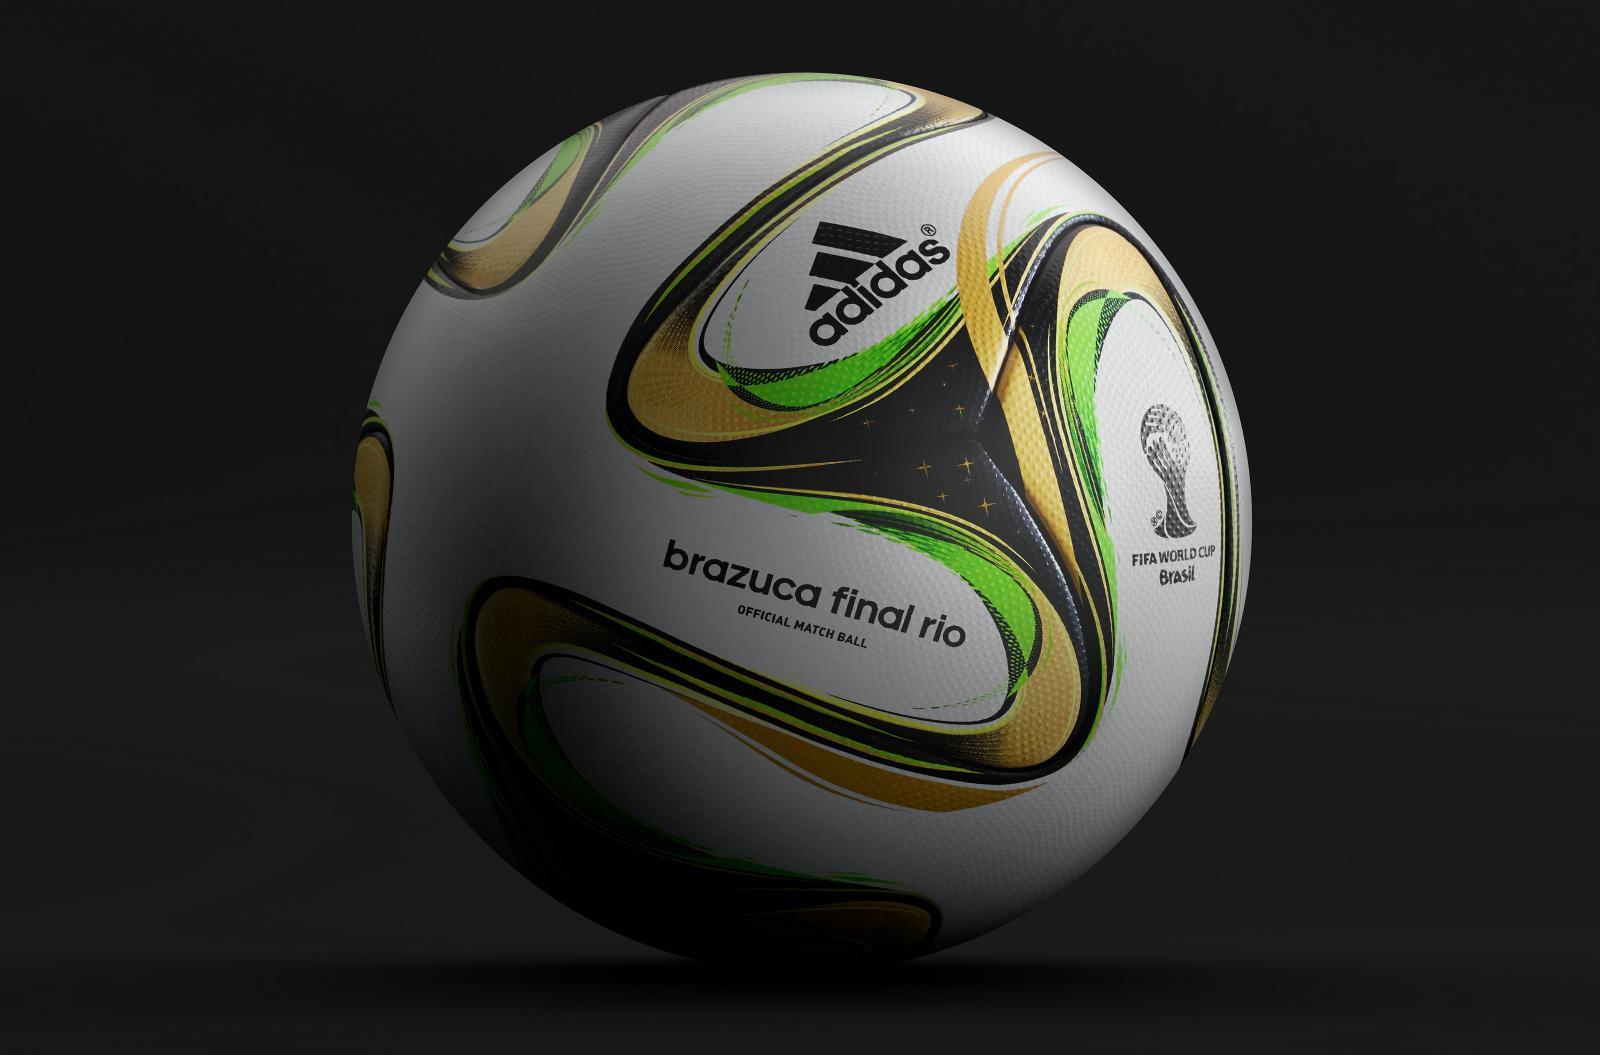 brazuca soccer ball final